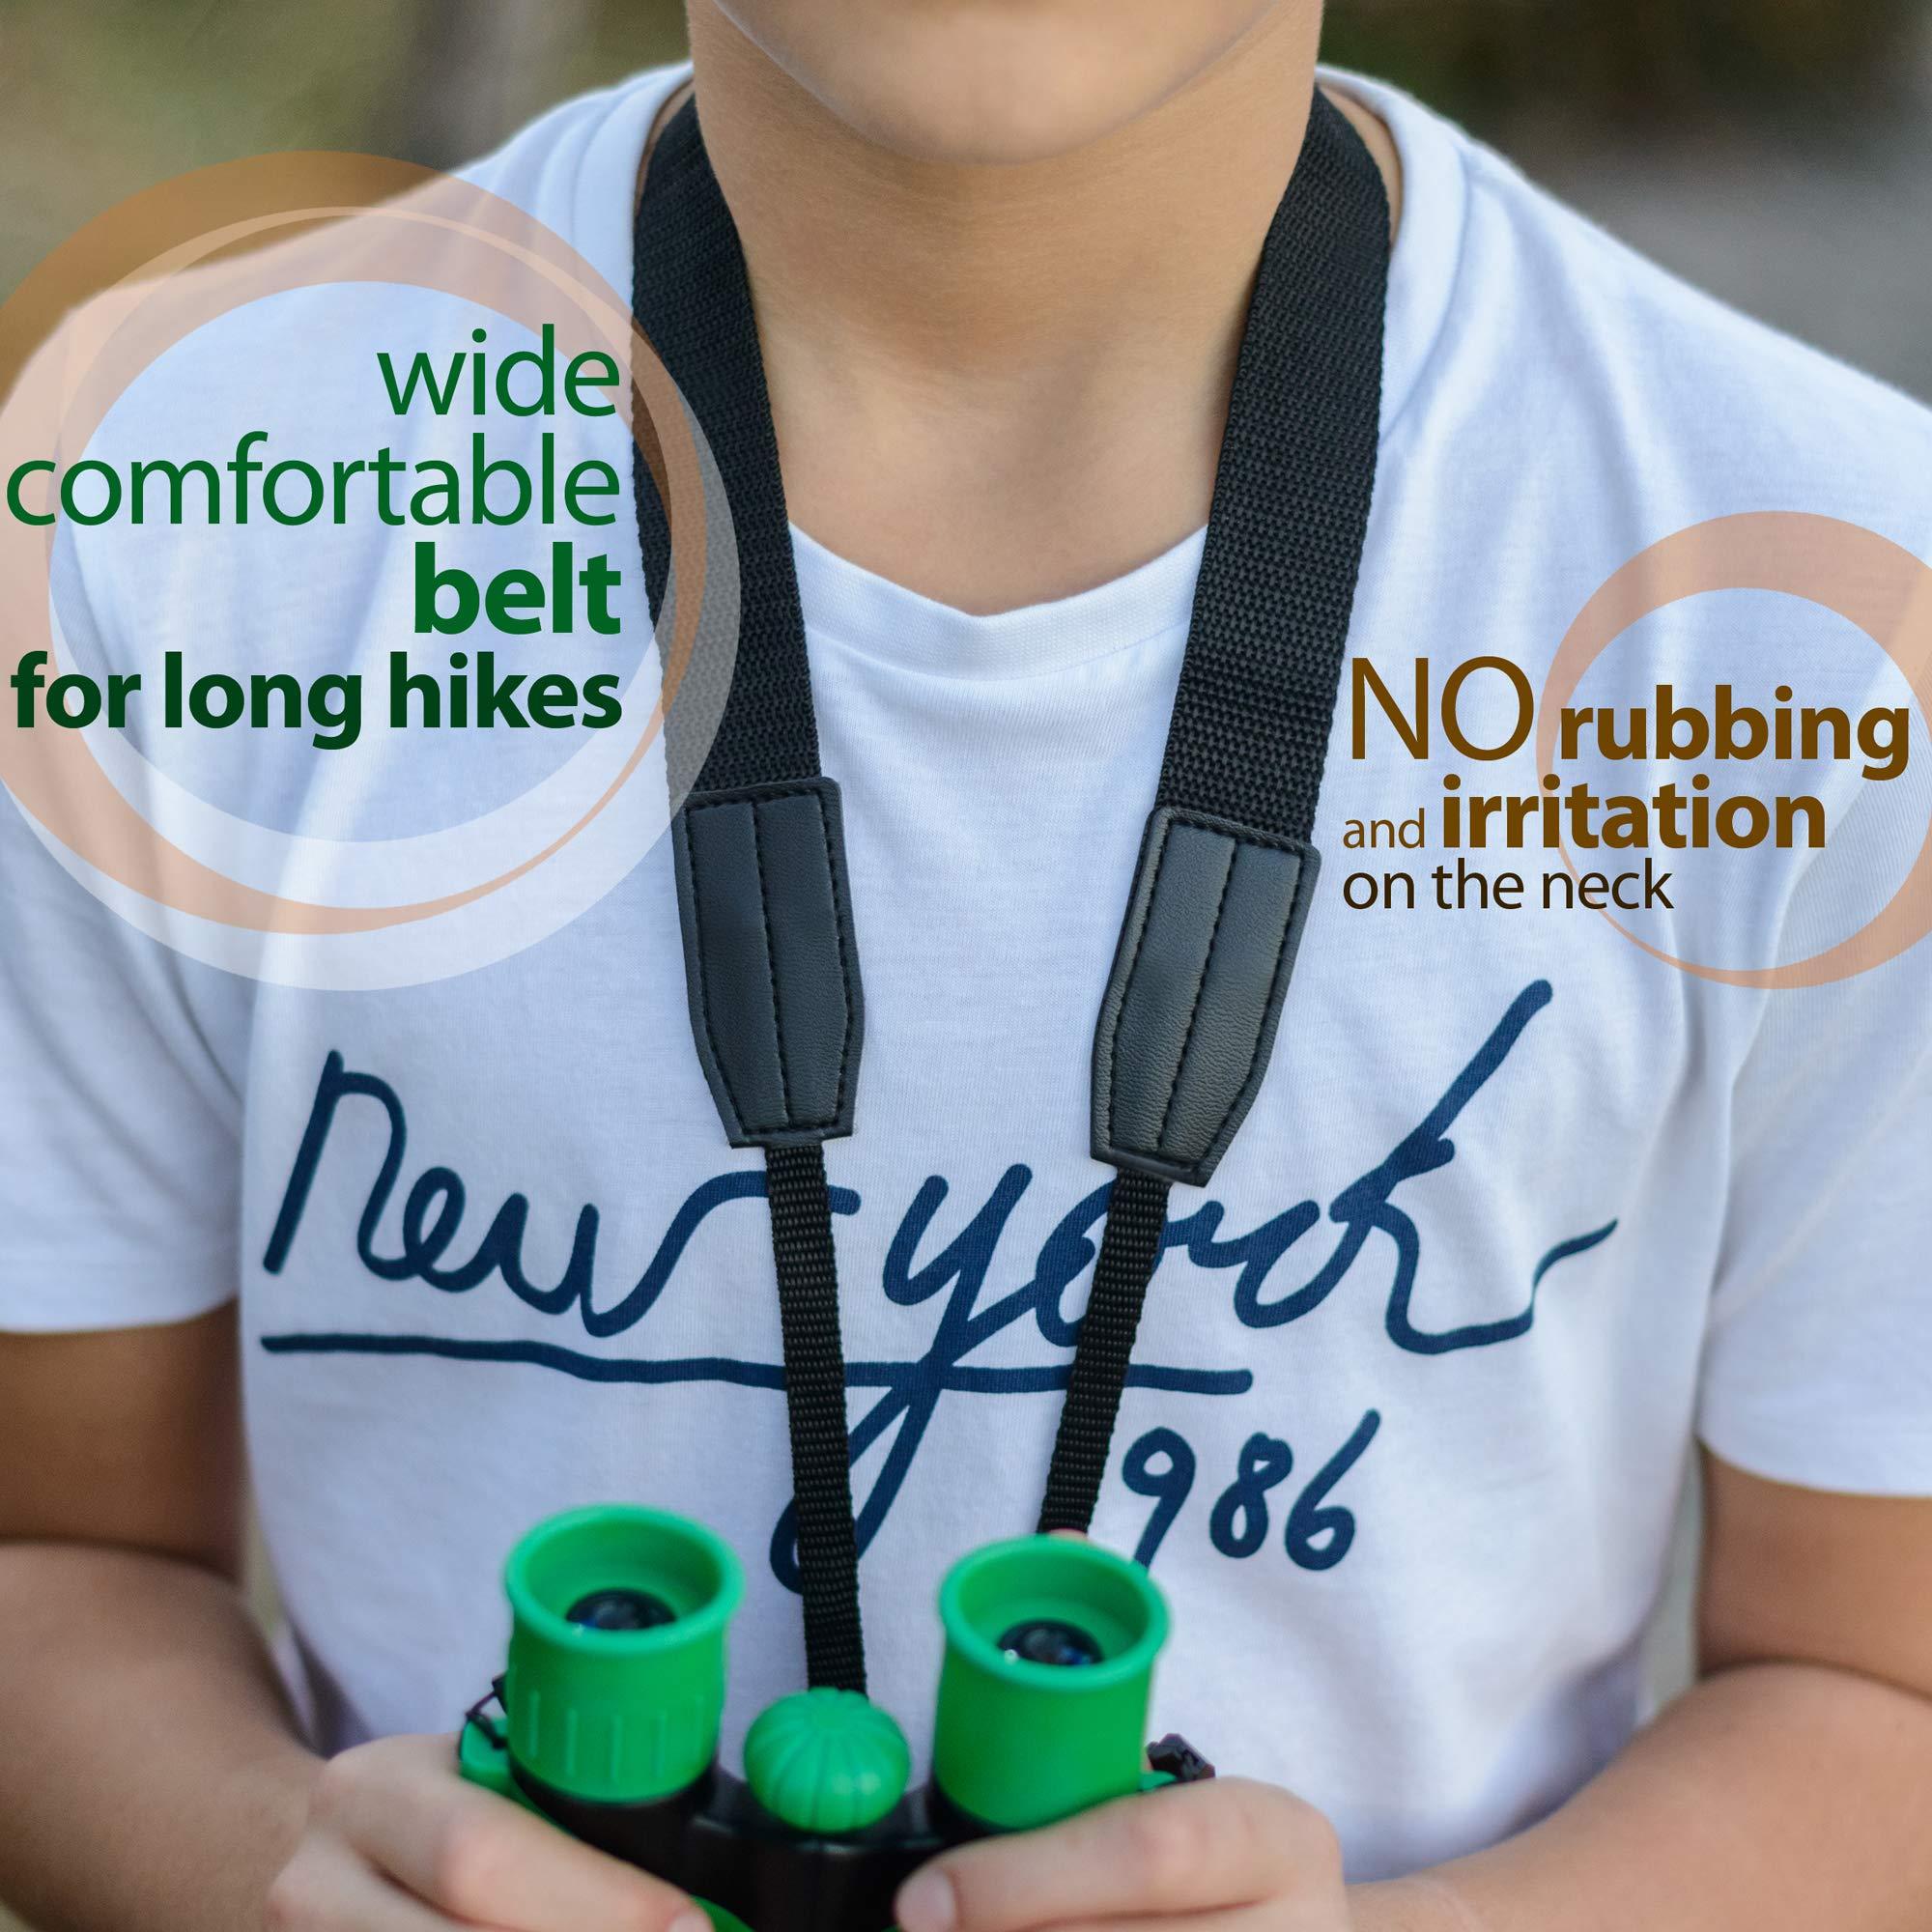 RO Kids Games Binoculars Compact Toy Set for Bird Watching, Spy Hiking Kit for Children, Outdoor Exploration Kit for Backyard Safari, Outside Play, Boys & Girls Binocular, Waterproof & Shockproof by RO kids games (Image #2)